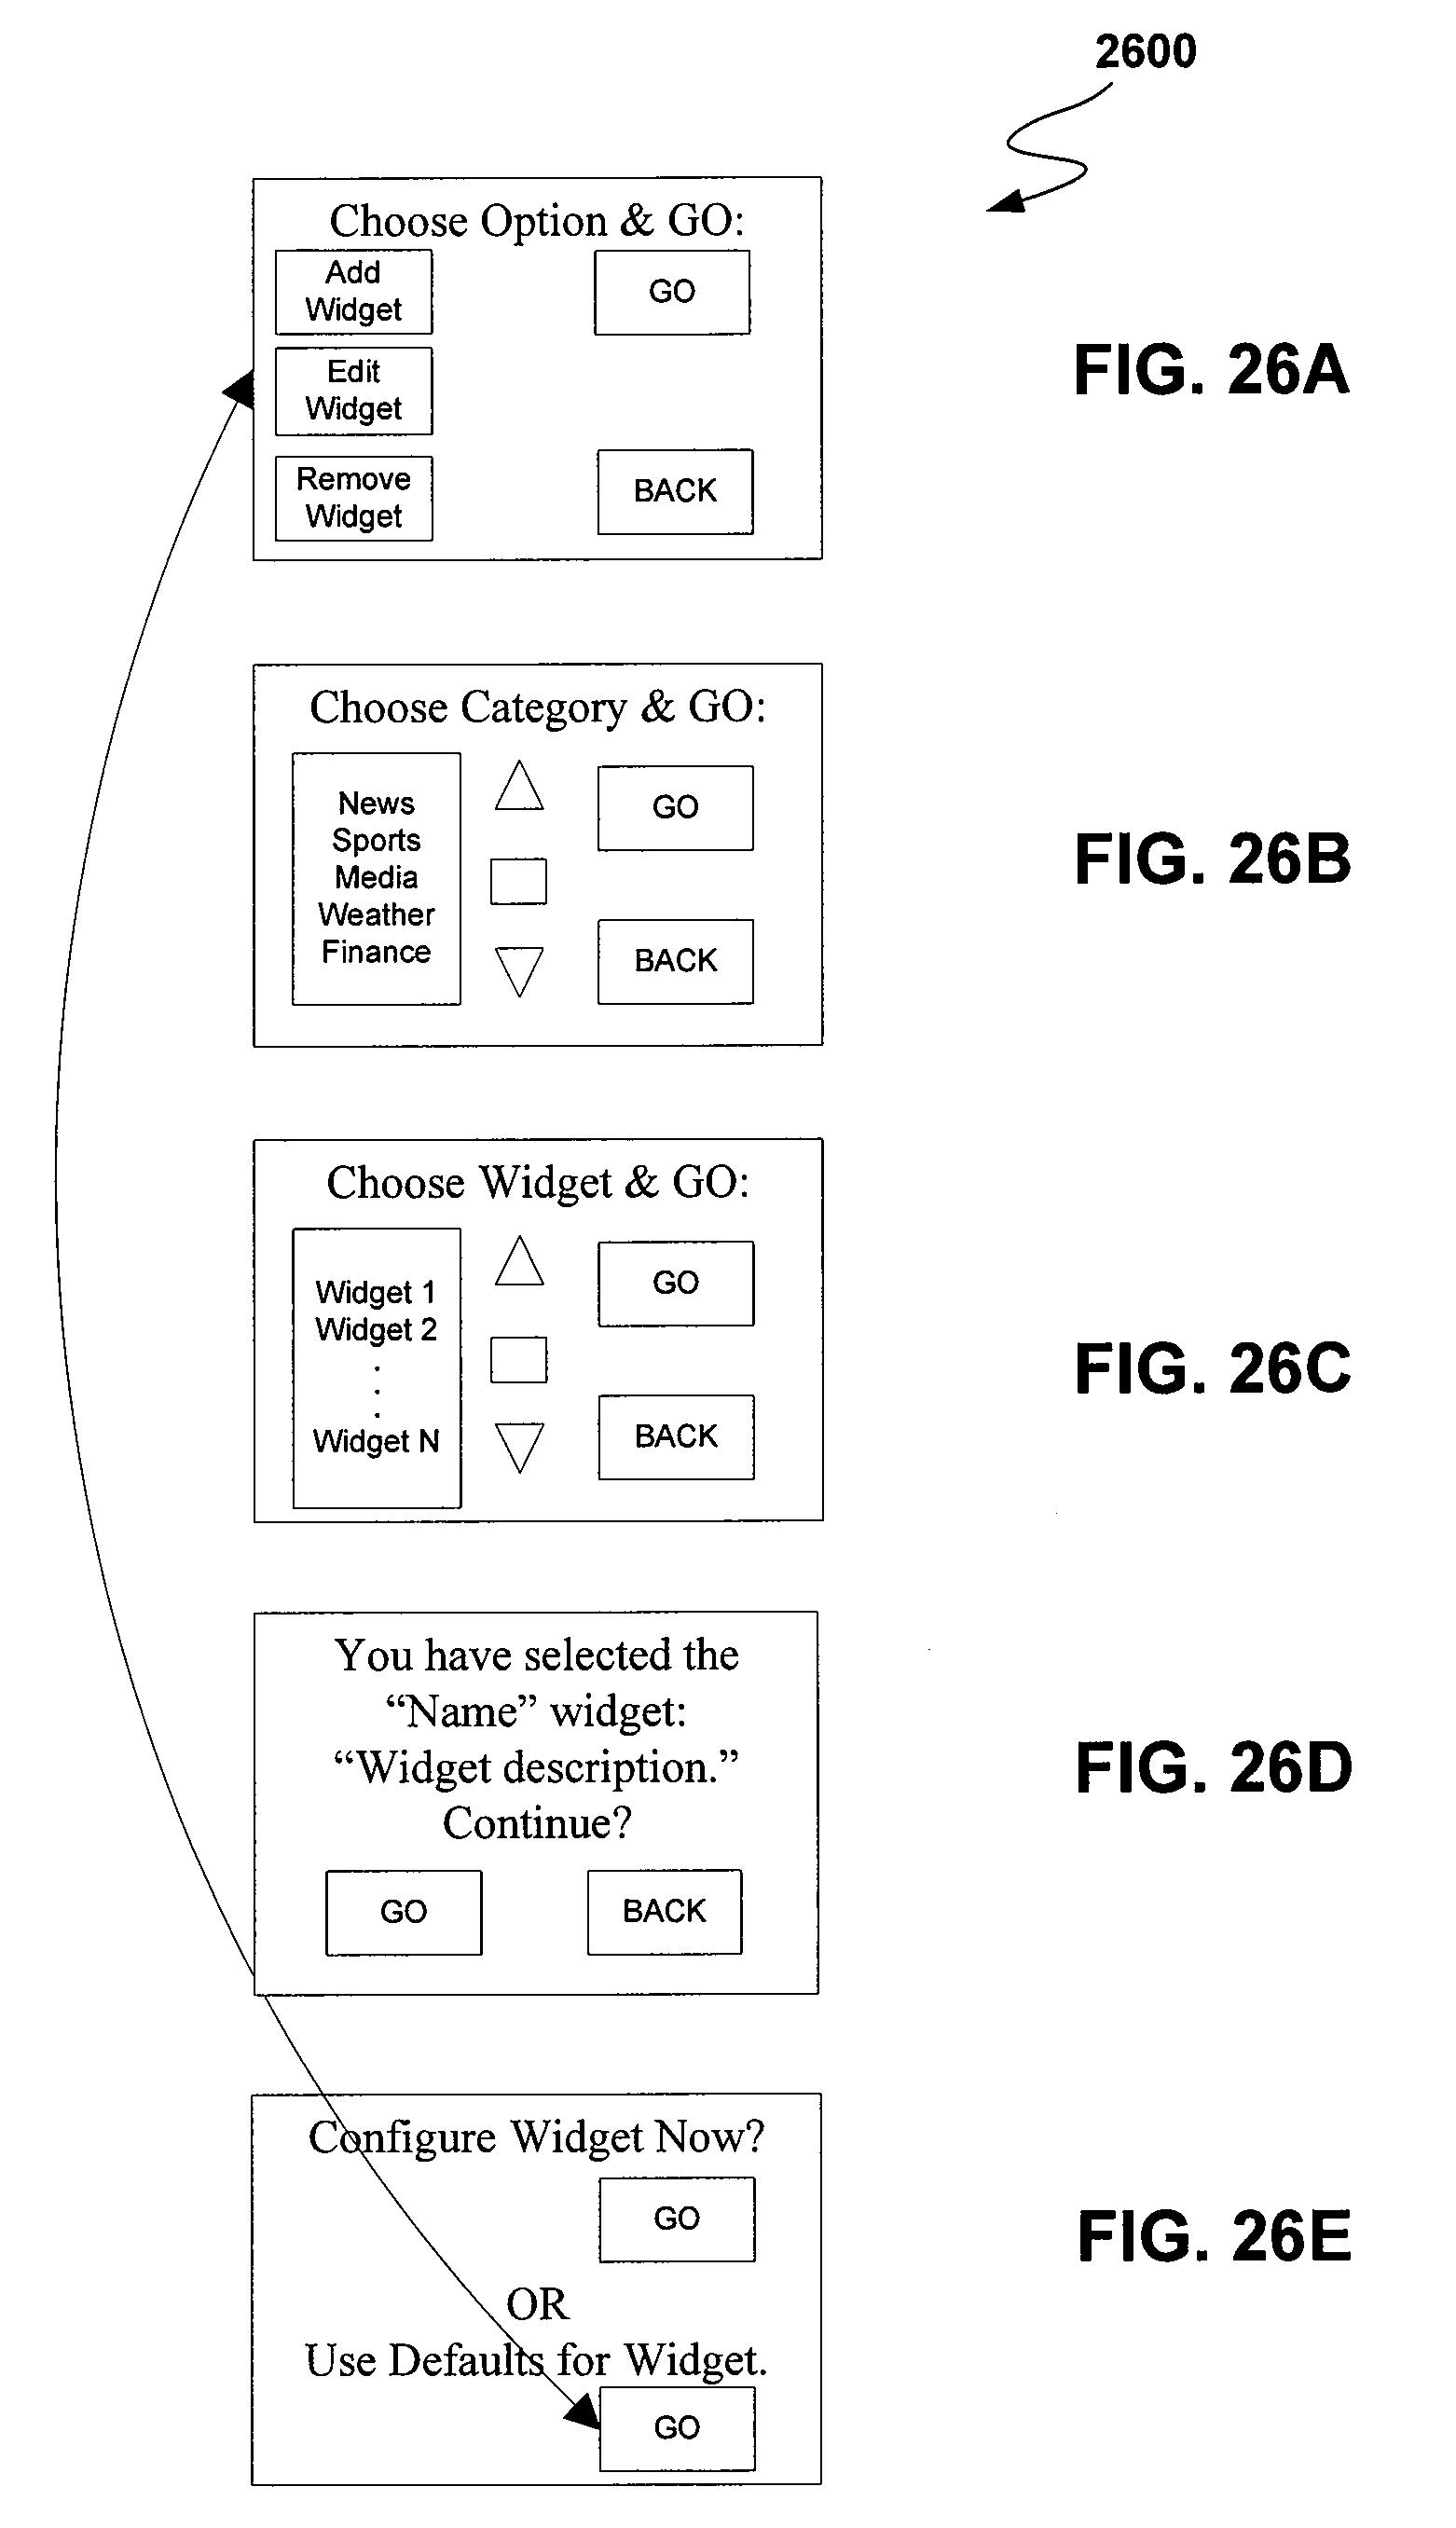 Patent US 7,778,792 B2